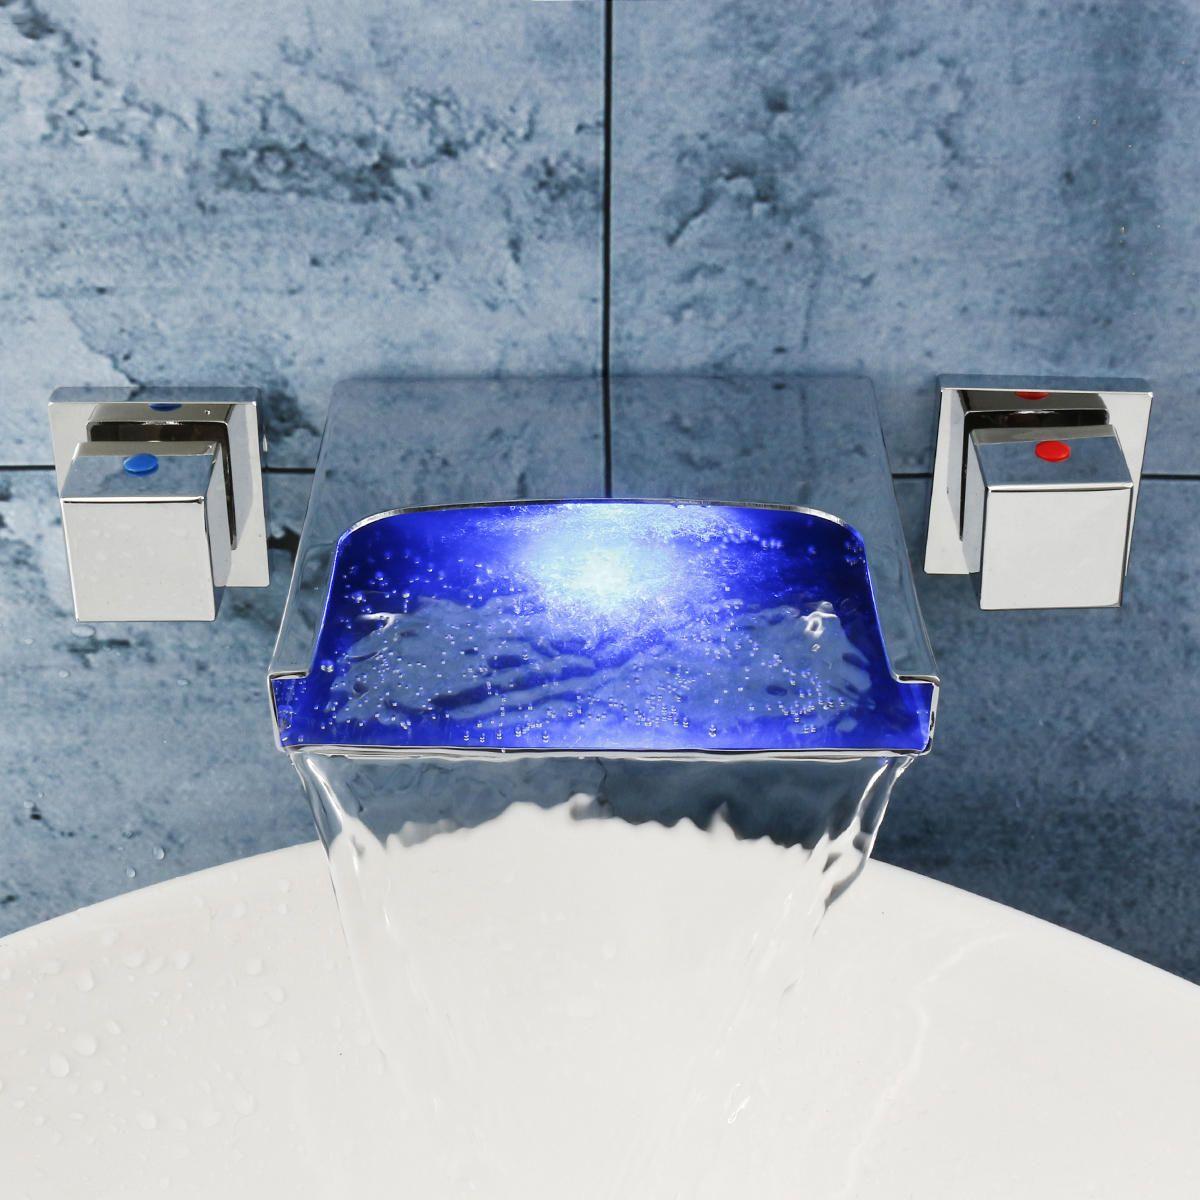 LED Waterfall Bathroom Basin Faucet Mixer Taps Wall Mounted Handheld Tub Filler Shower Dual Handles